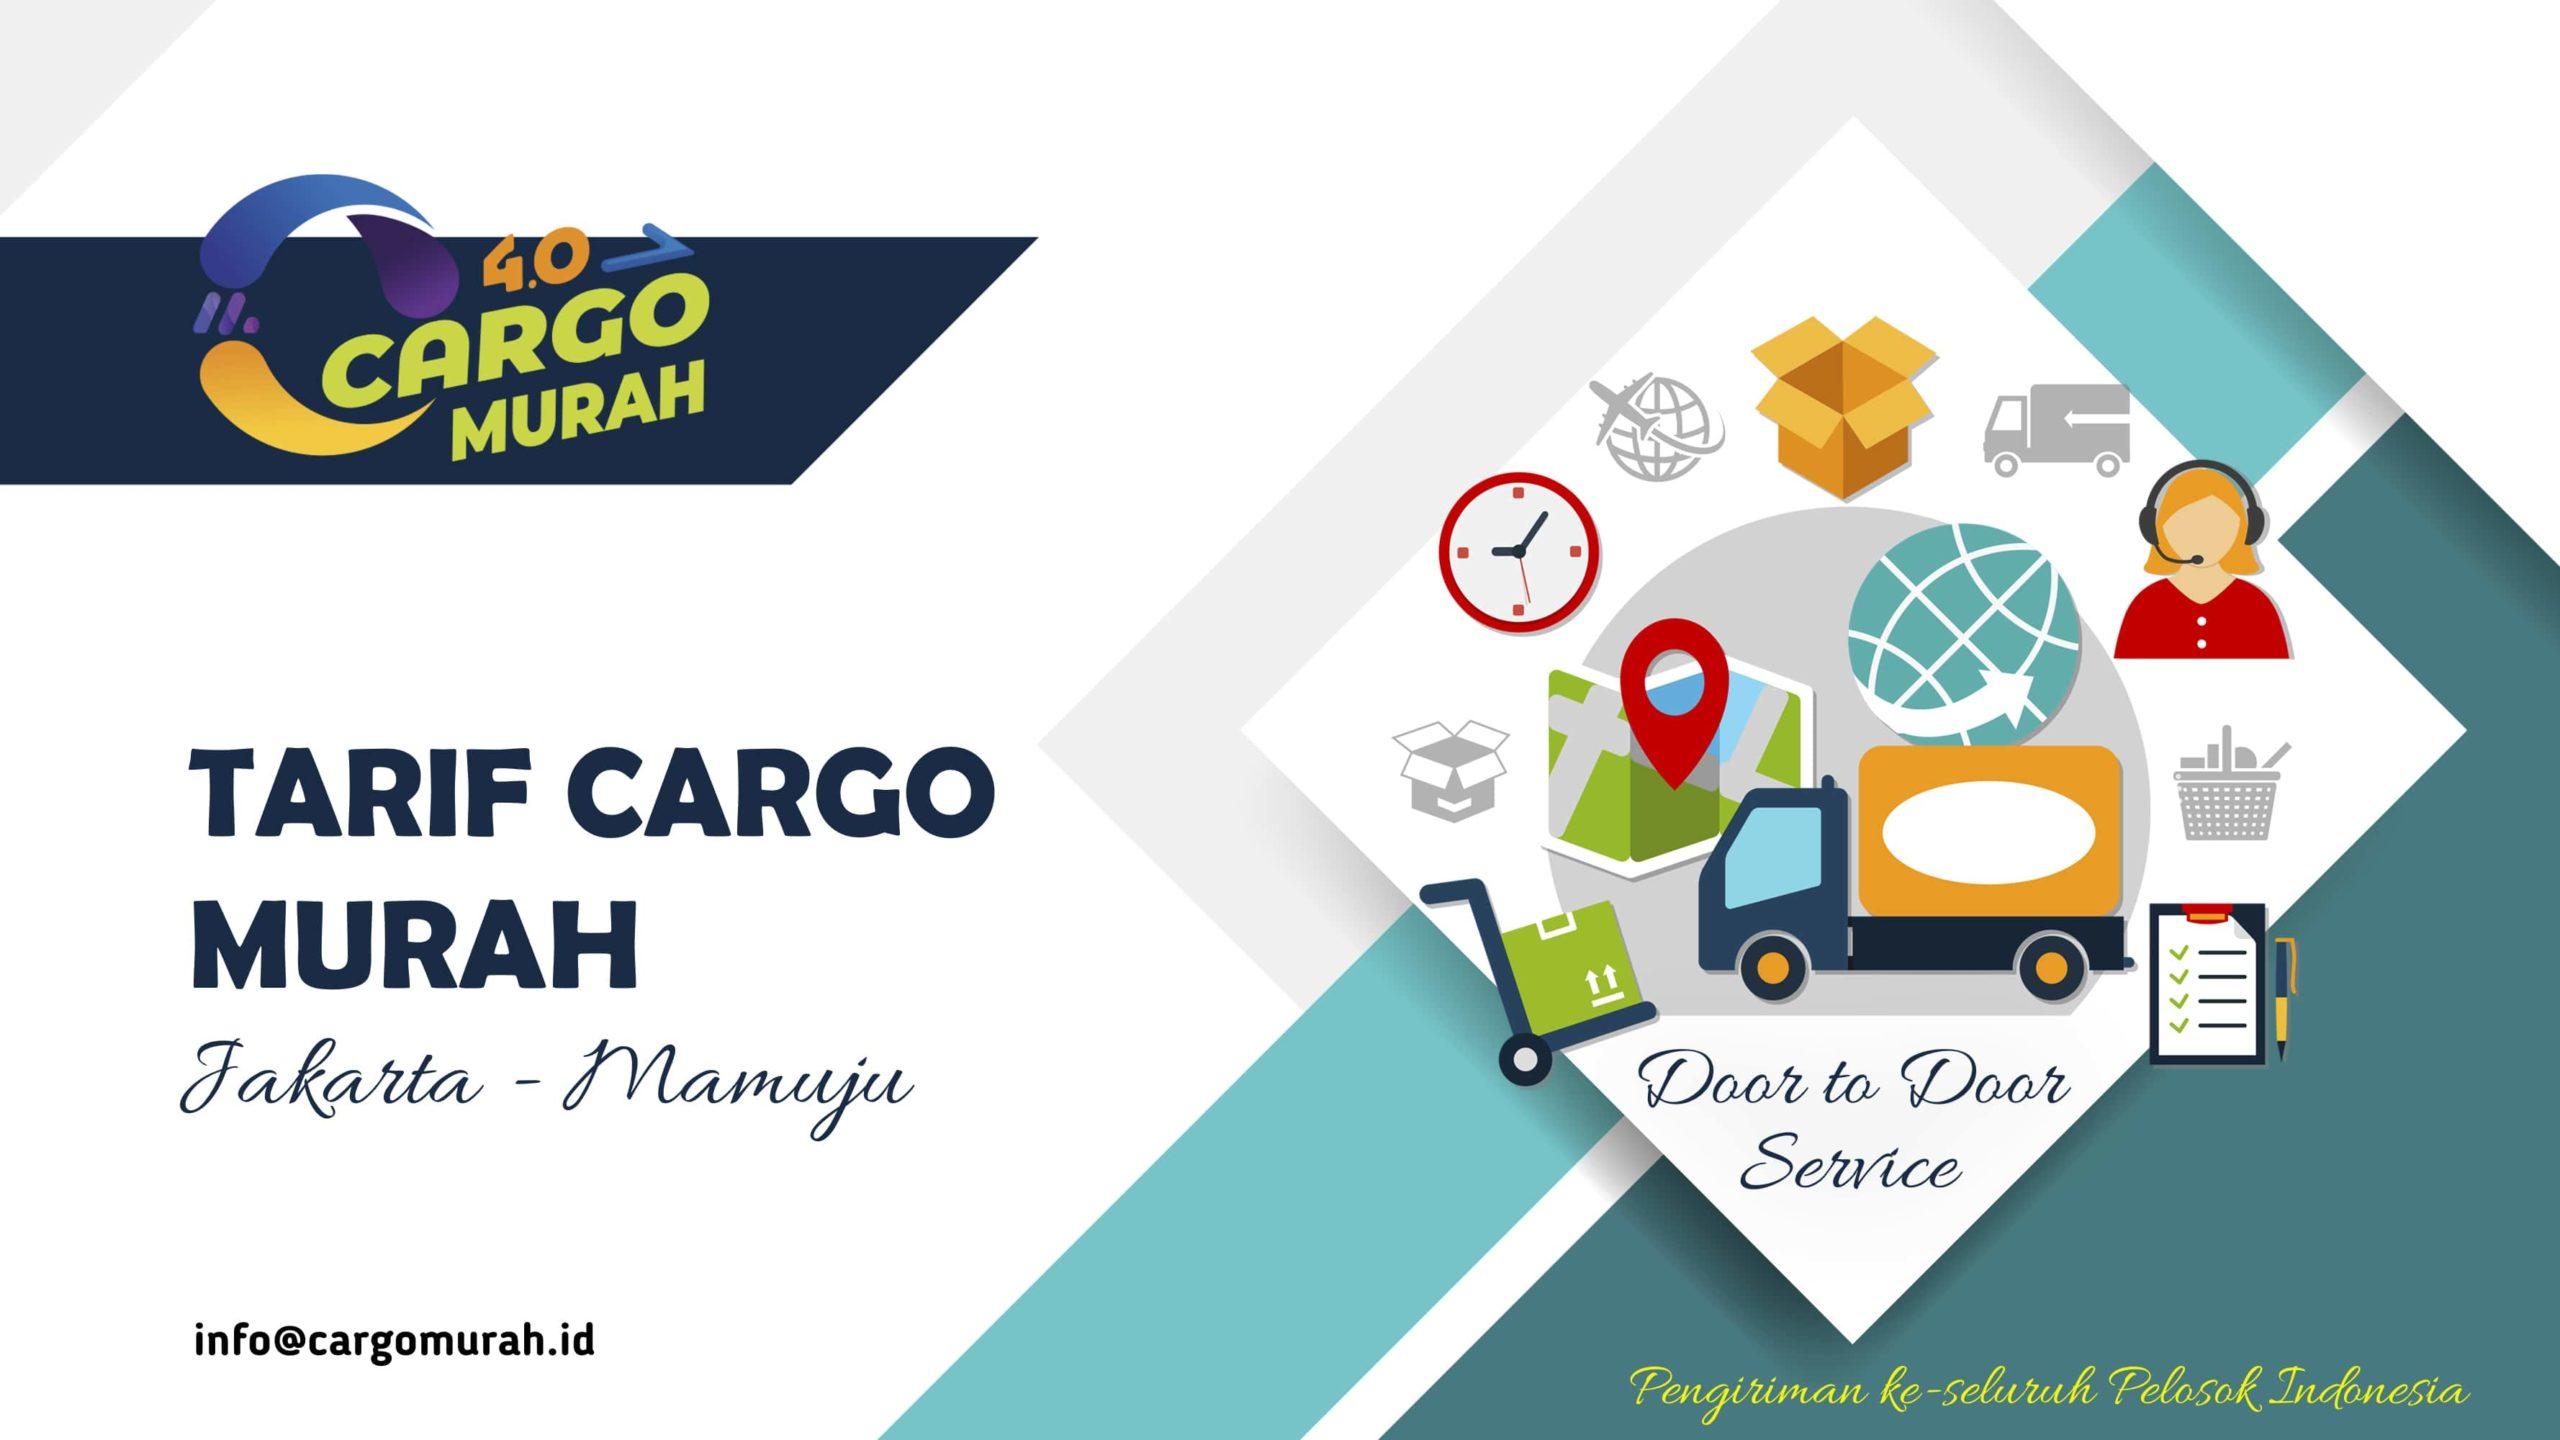 Jasa Ekspedisi Cargo Laut Jakarta Mamuju